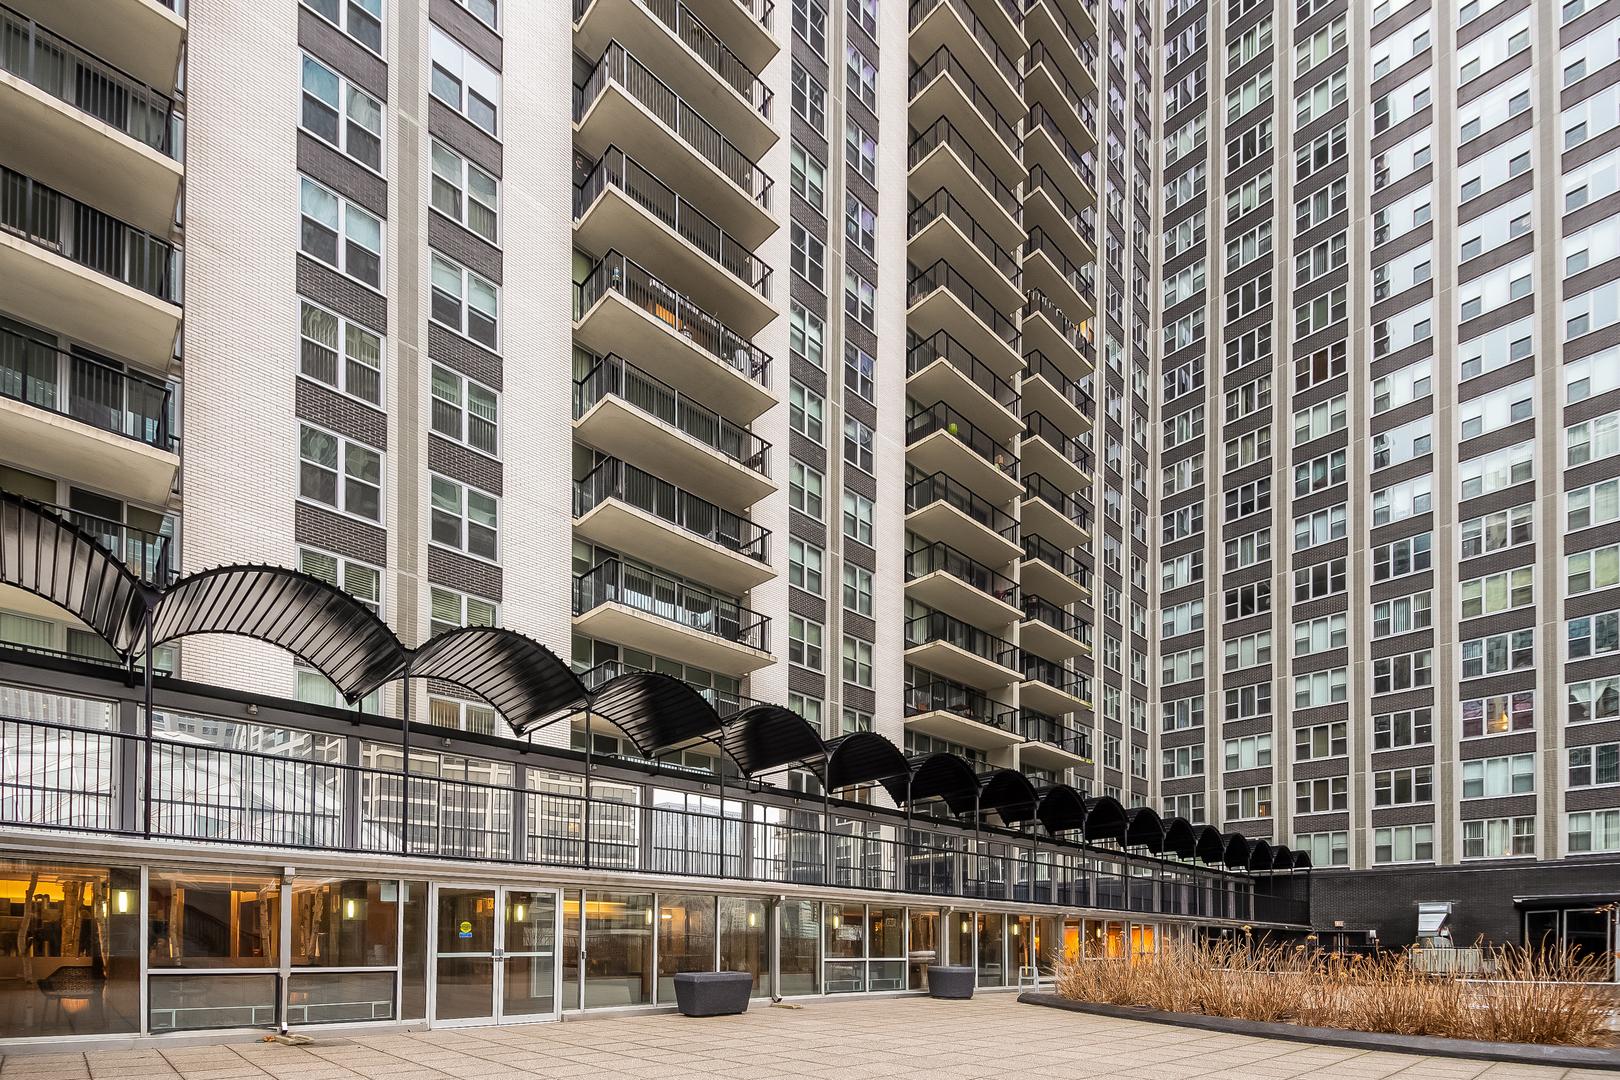 400 Randolph Unit Unit 2108 ,Chicago, Illinois 60601